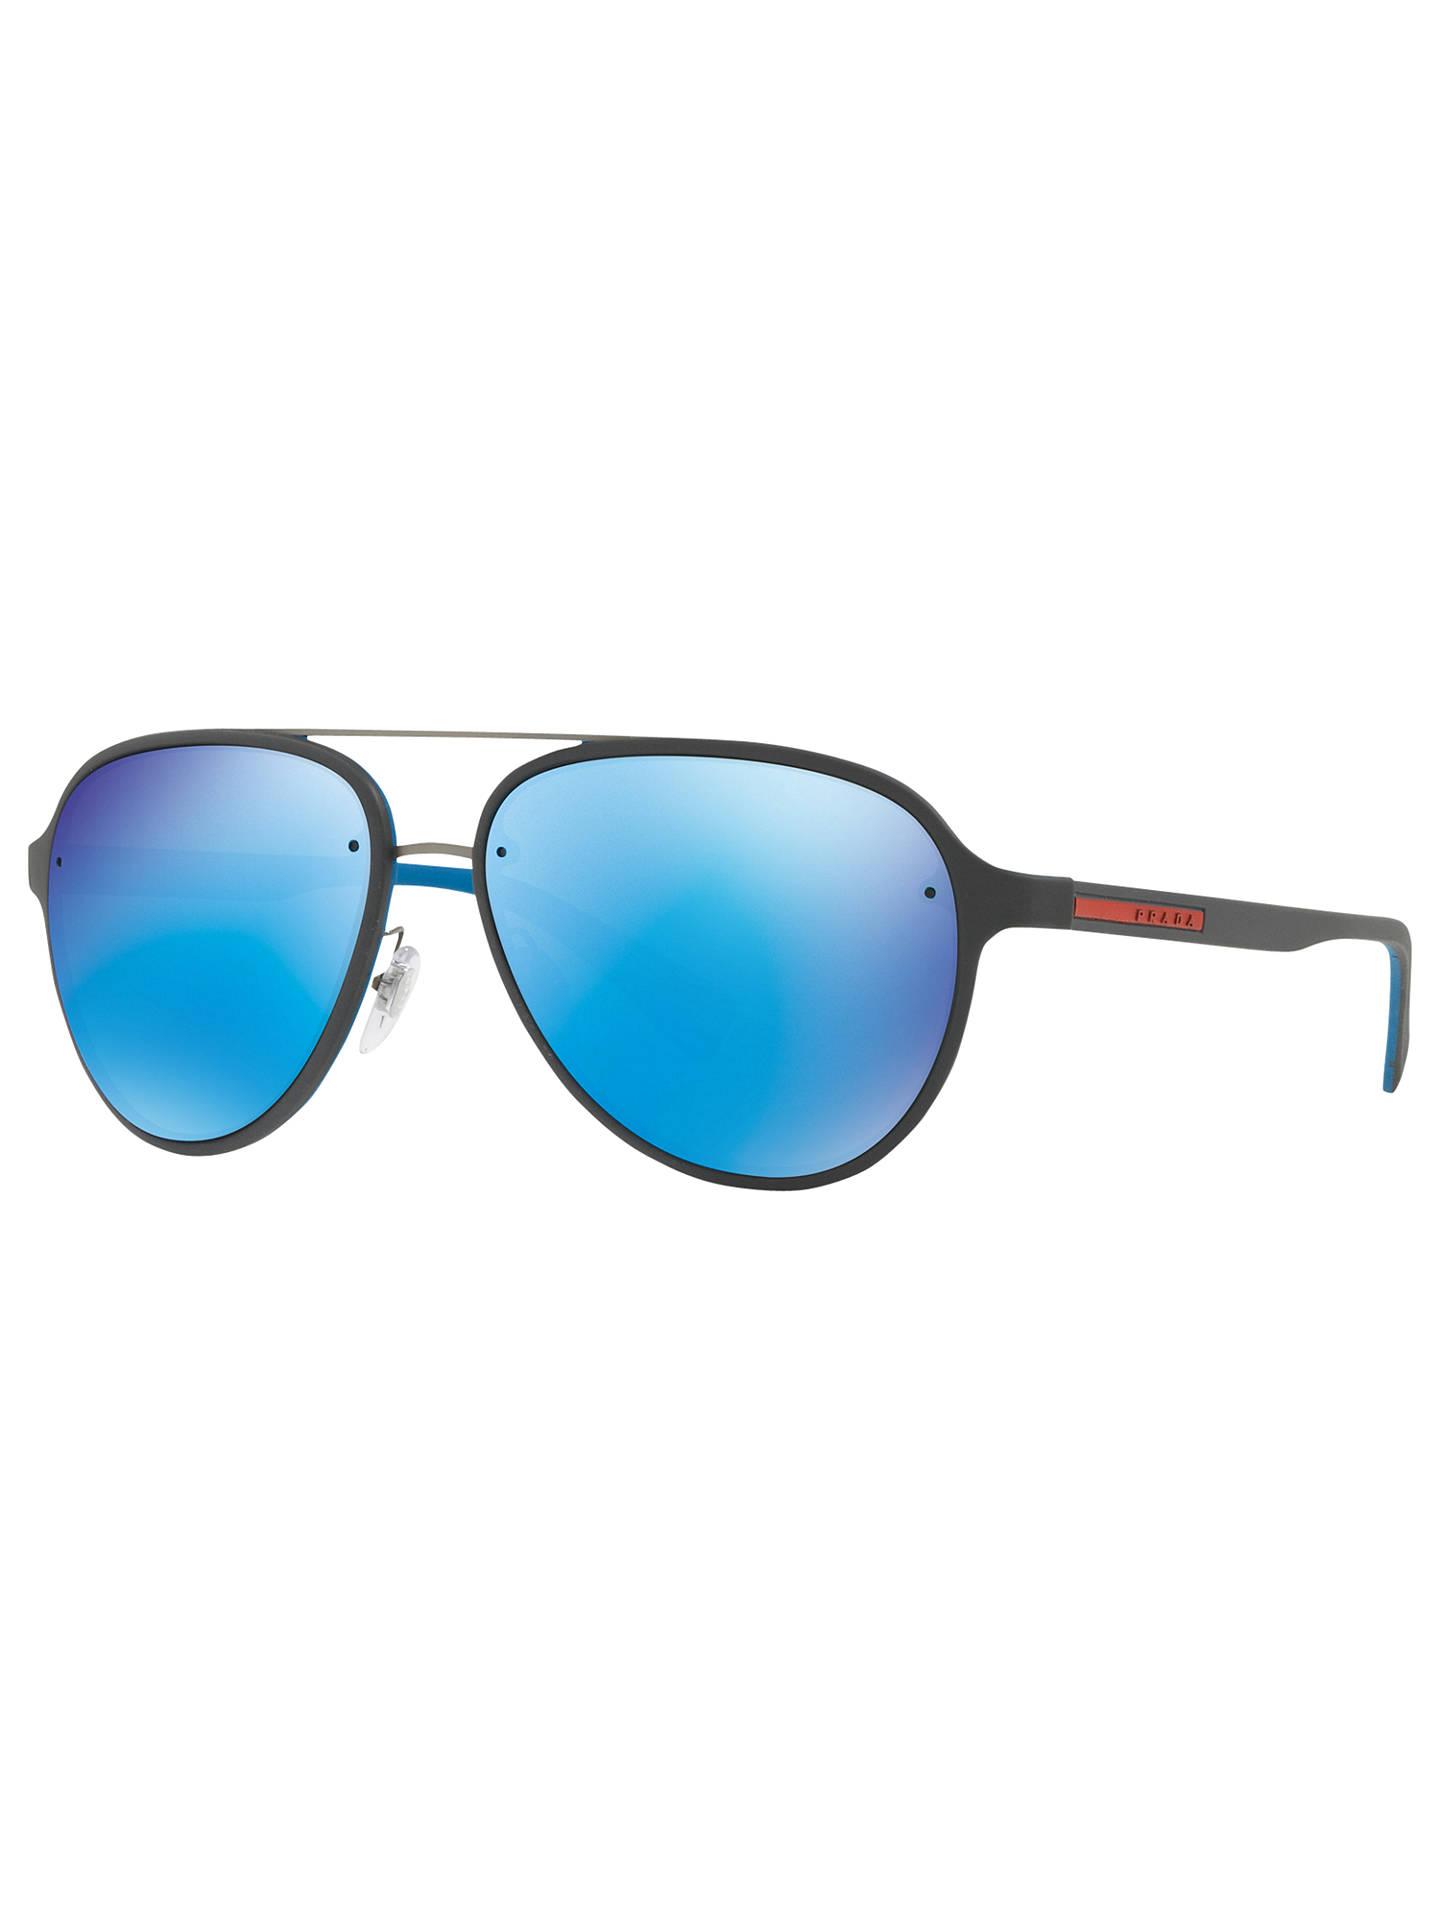 76718288dad1a Prada Linea Rossa PS 52SS Aviator Sunglasses at John Lewis   Partners